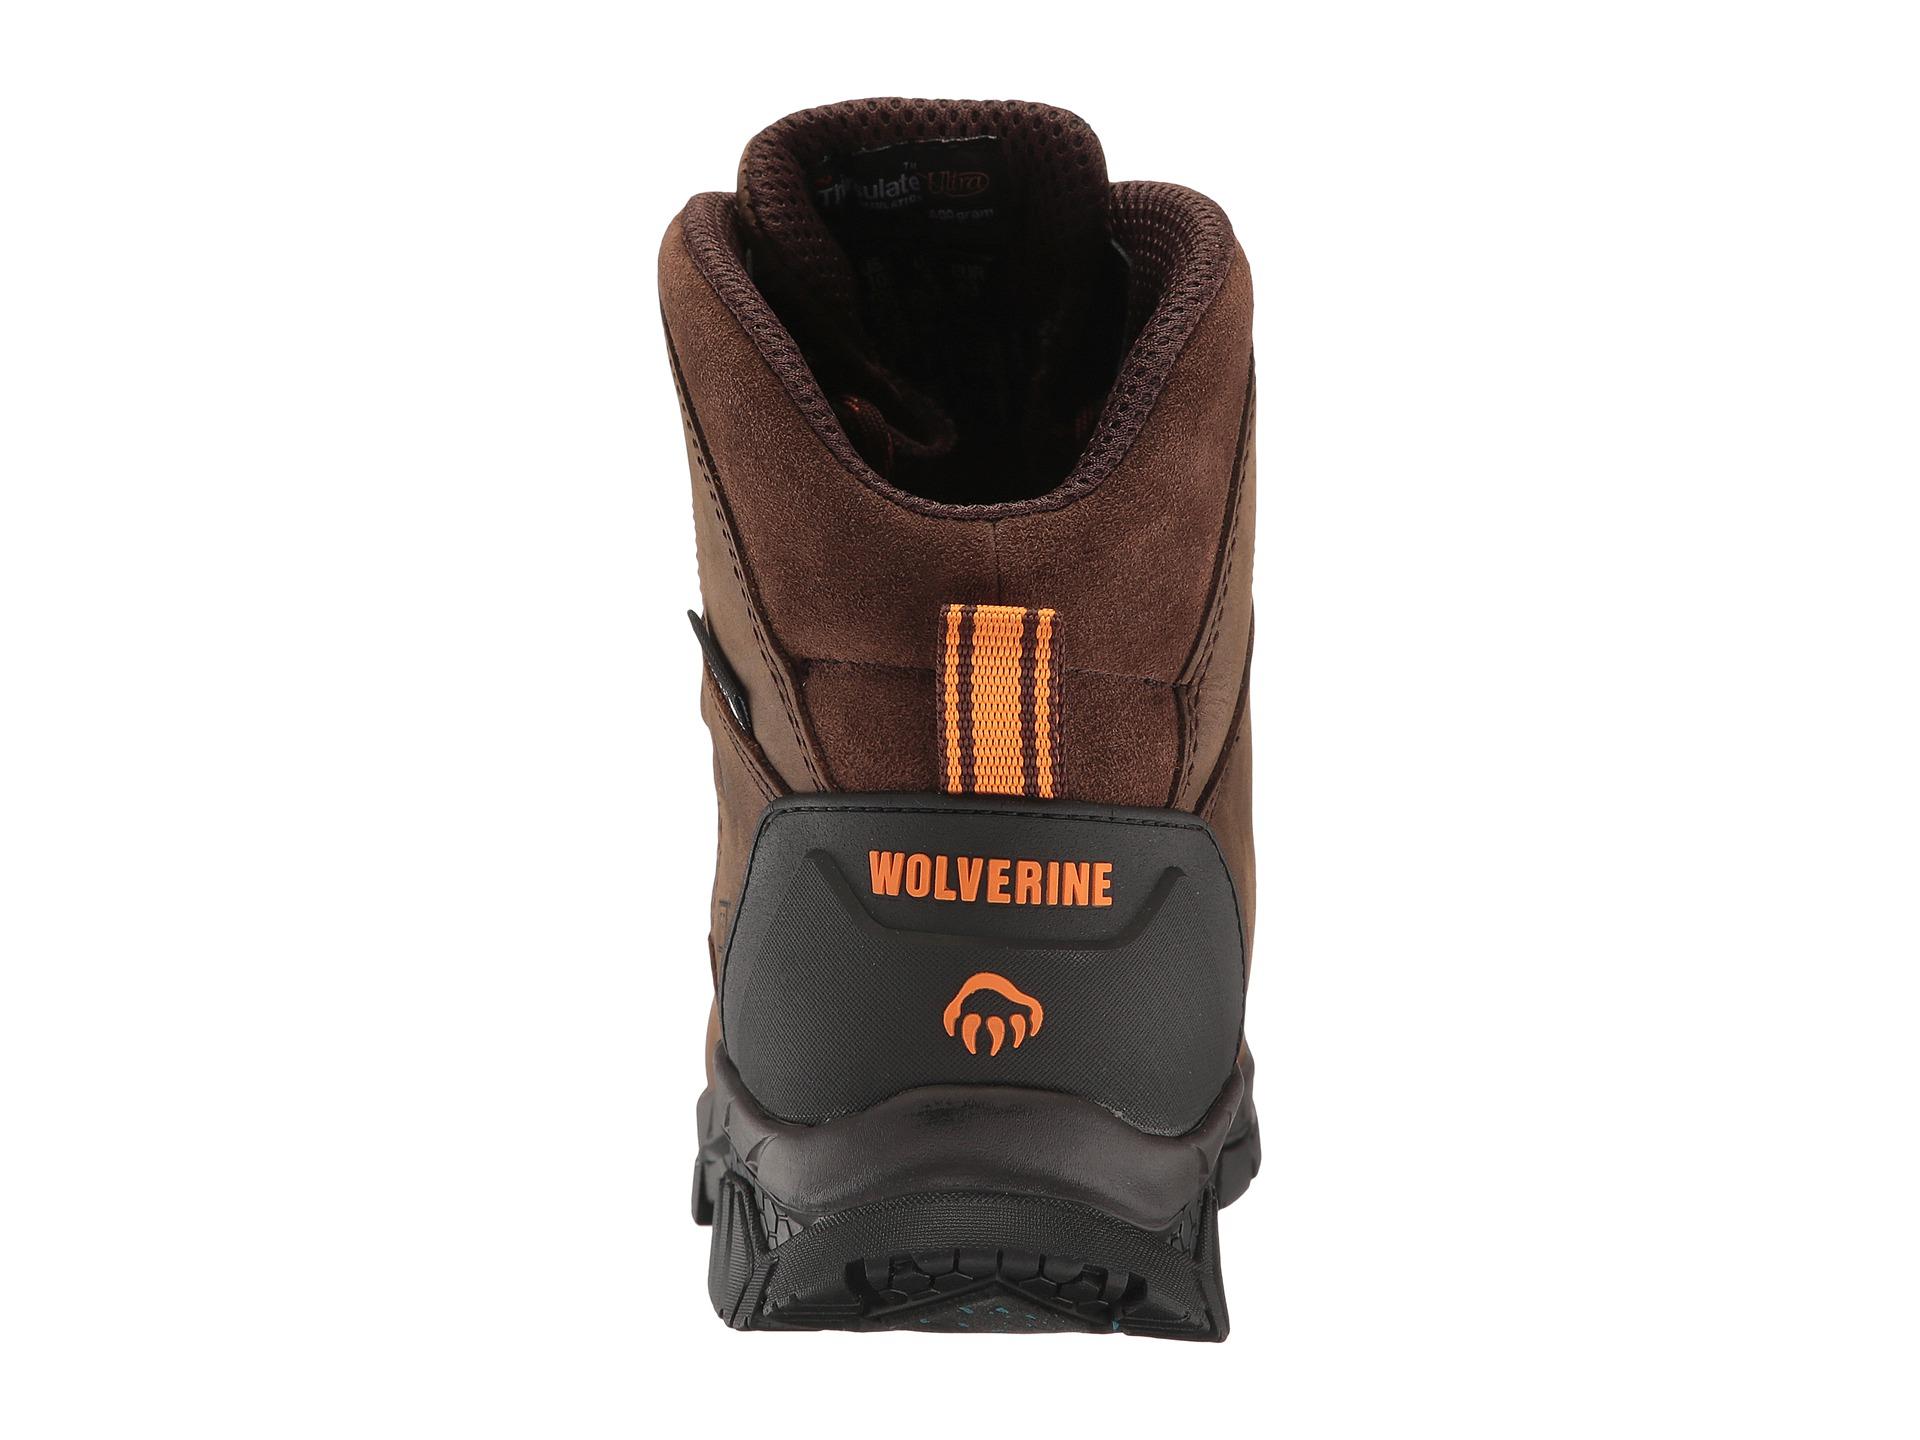 3pk wolverine leather work gloves extra large - Carhartt Men S Ts Flip It Glove 7 Wolverine Leather Work Gloves Premium Glove Riding Source 3pk Wolverine Leather Work Gloves Extra Large